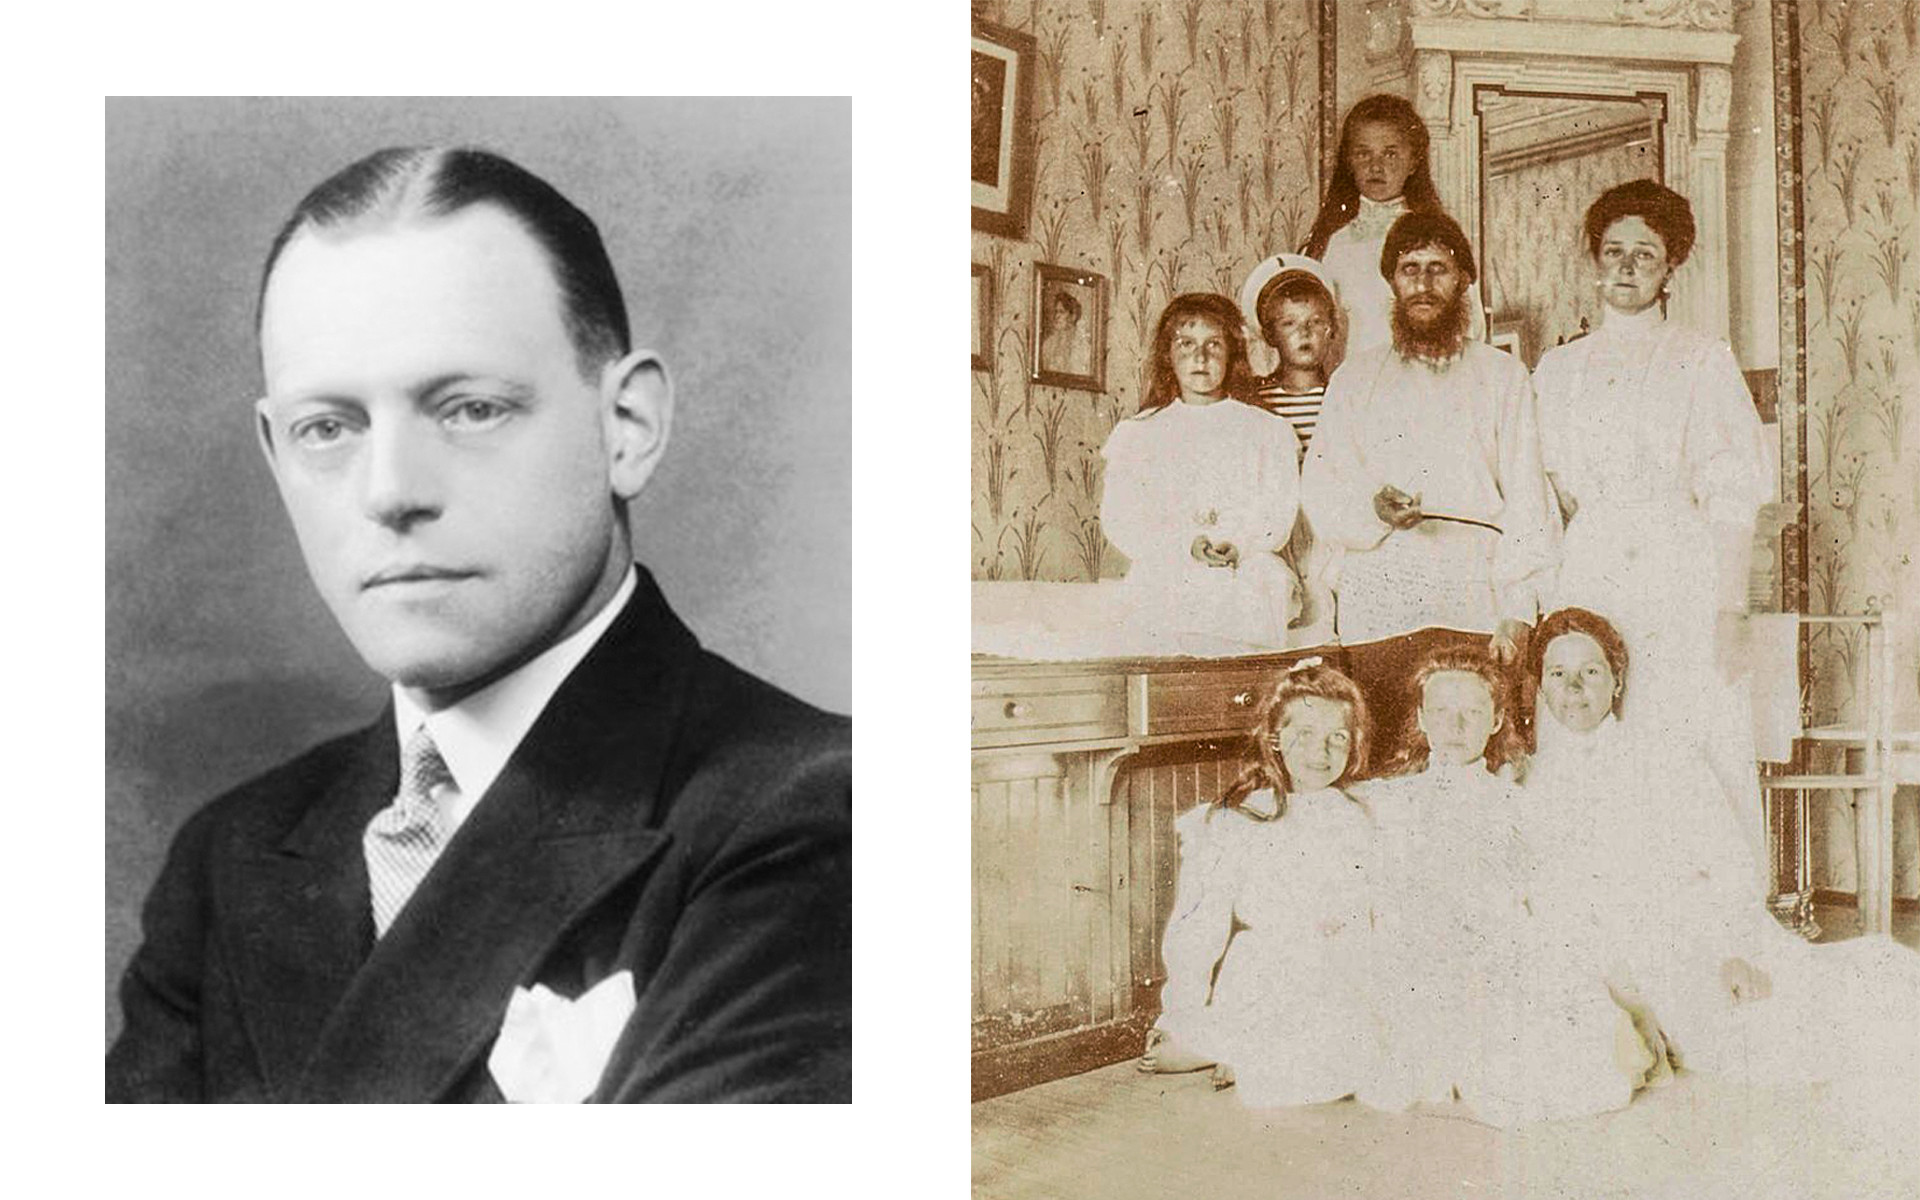 Left: Oswald Rayner. Right: Rasputin with the Romanov family